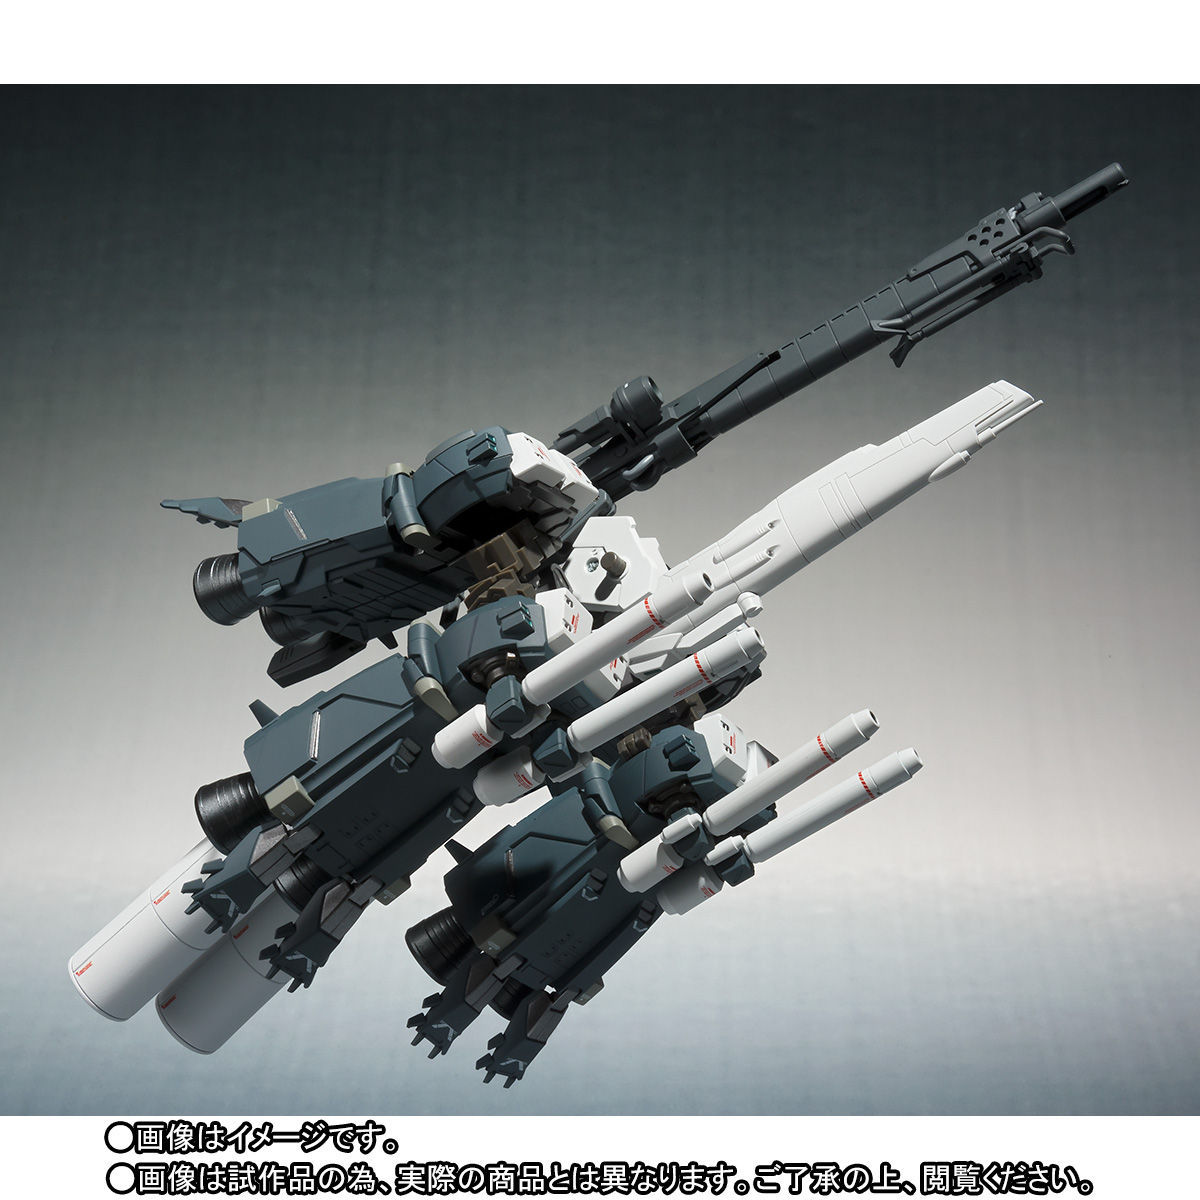 METAL ROBOT魂(Ka signature)<SIDE MS>『Sガンダム専用オプションパーツ ブースターユニット』オプションパーツ-005